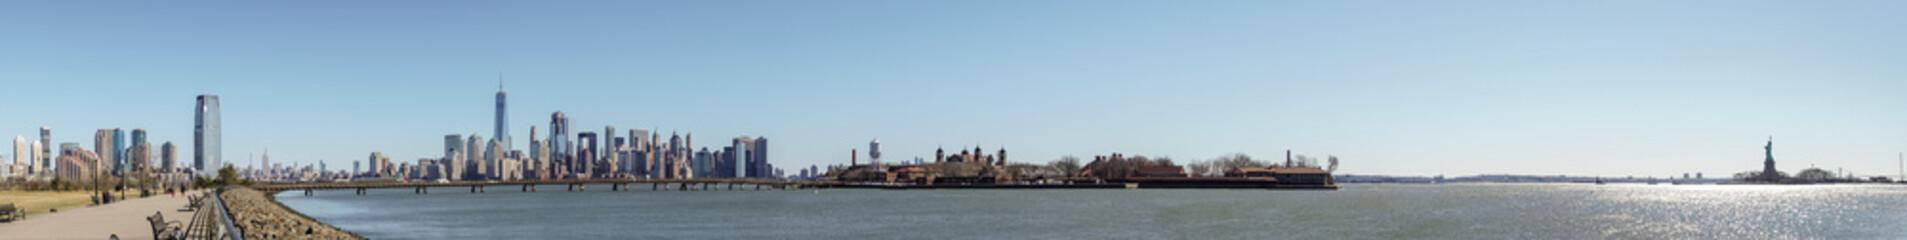 New York City skyline panorama from New Jersey park